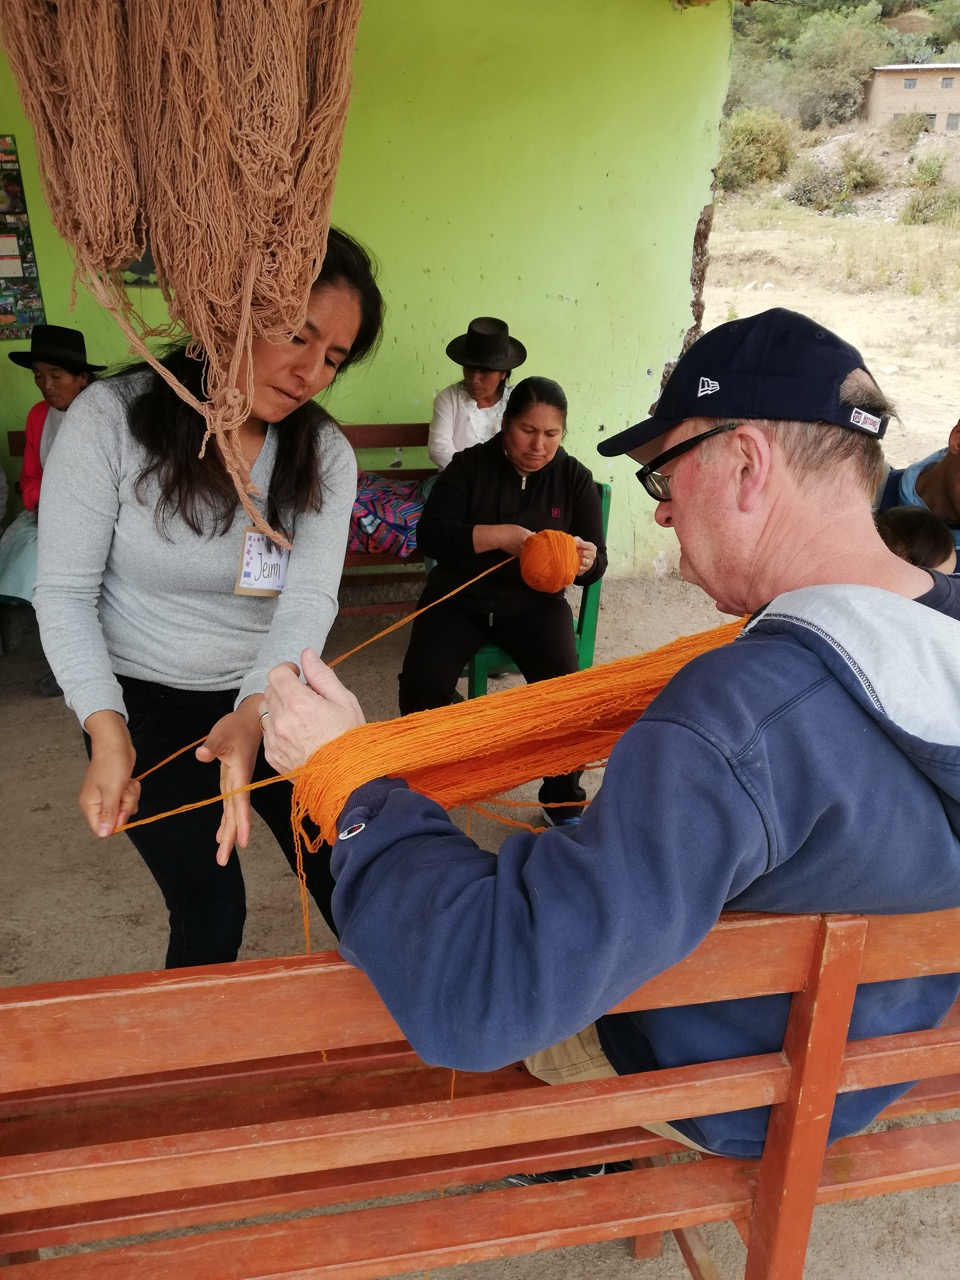 Spooling thread with the Puriyninchik Association members. Huanta, Peru.